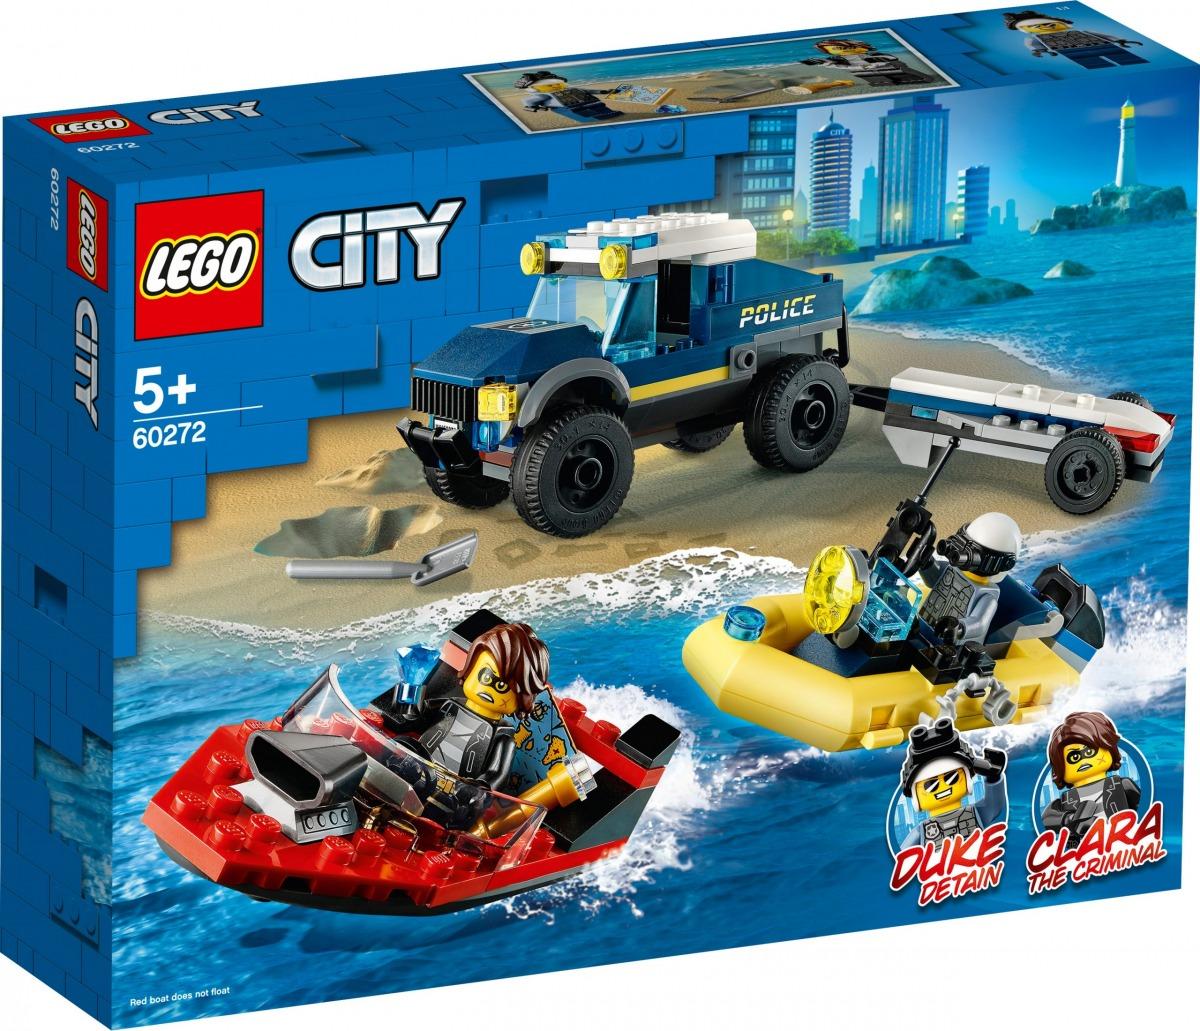 lego 60272 le transport de bateau de la police delite scaled